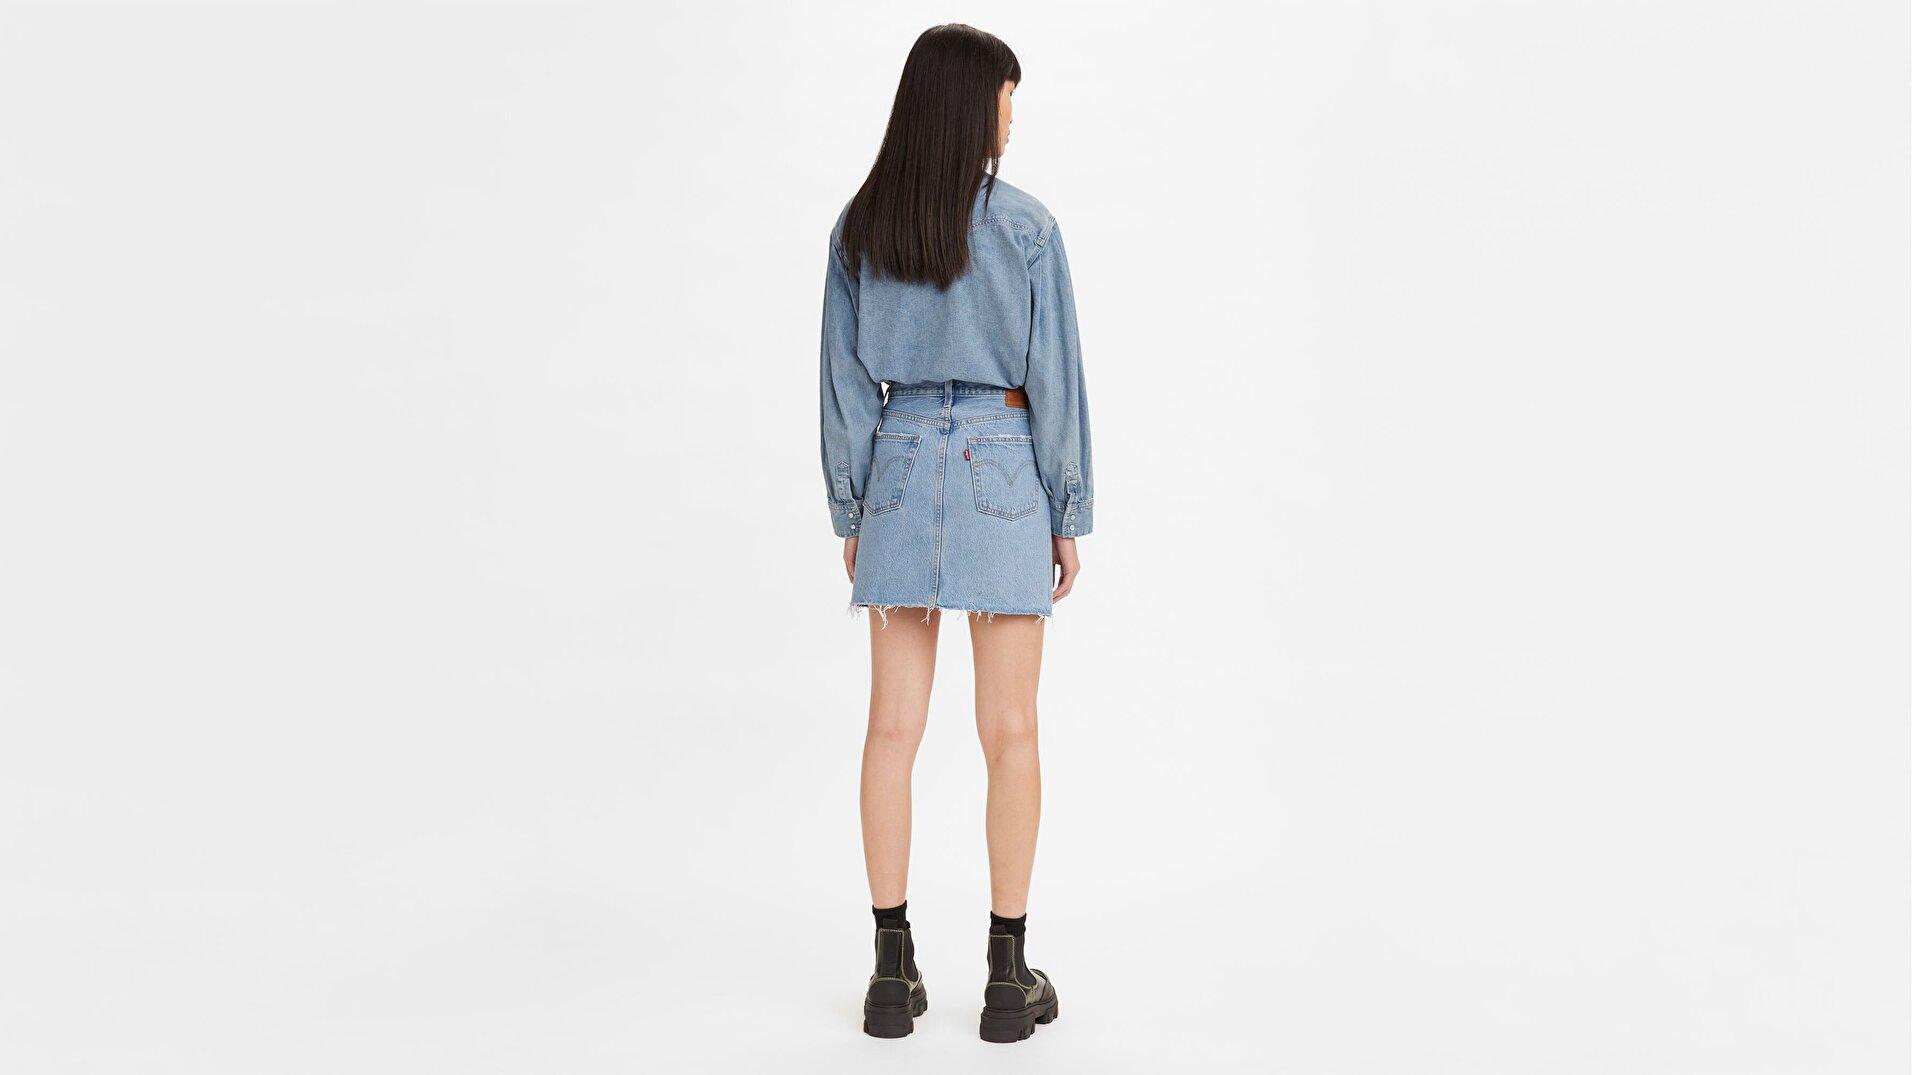 Deconstructed Kadın Jean Etek-Luxor Heat Skirt